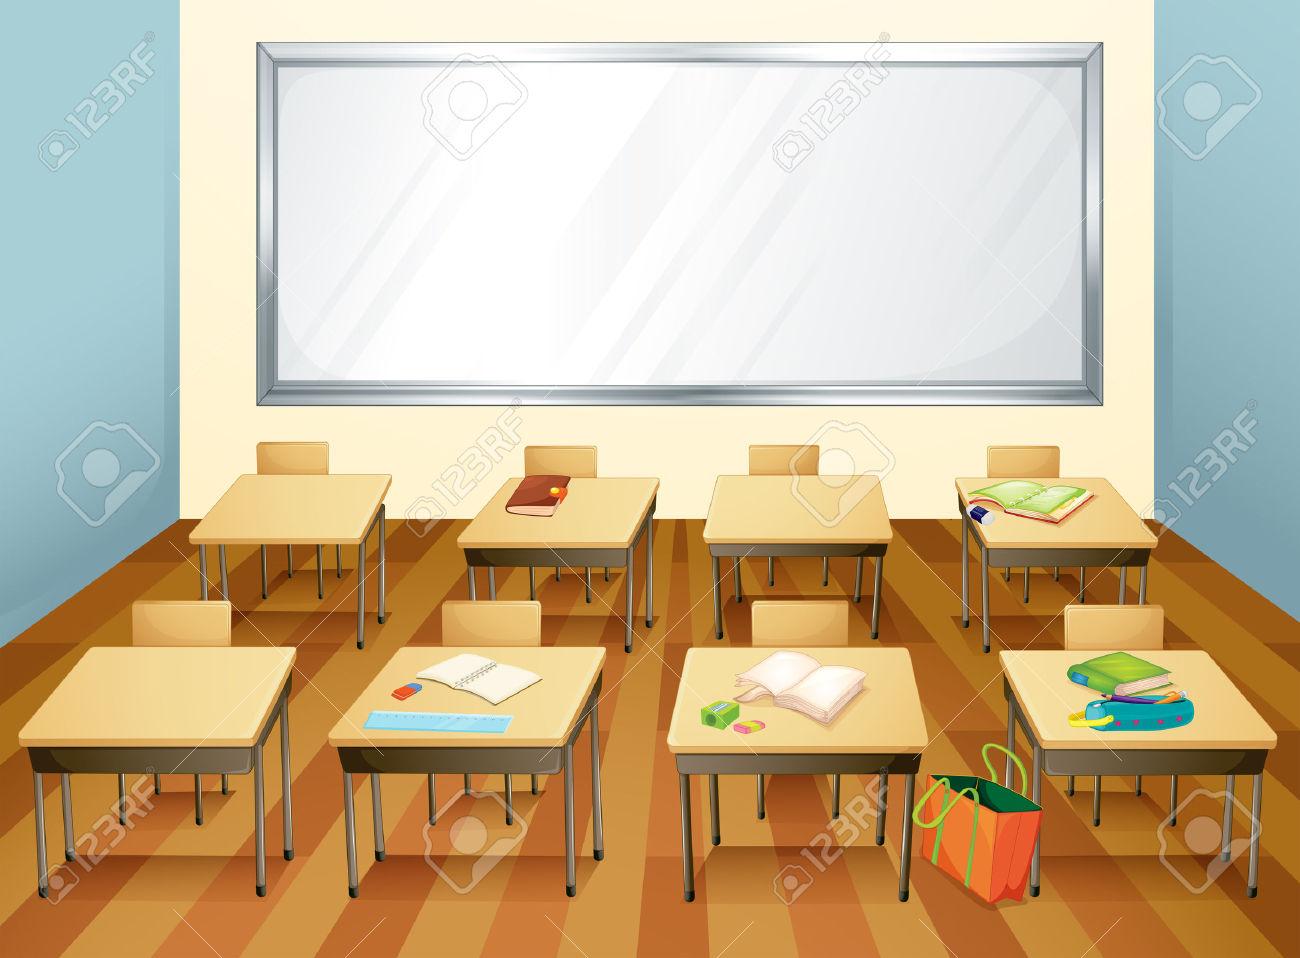 Elementary Classrooms Without Desks : Elementary classroom desks